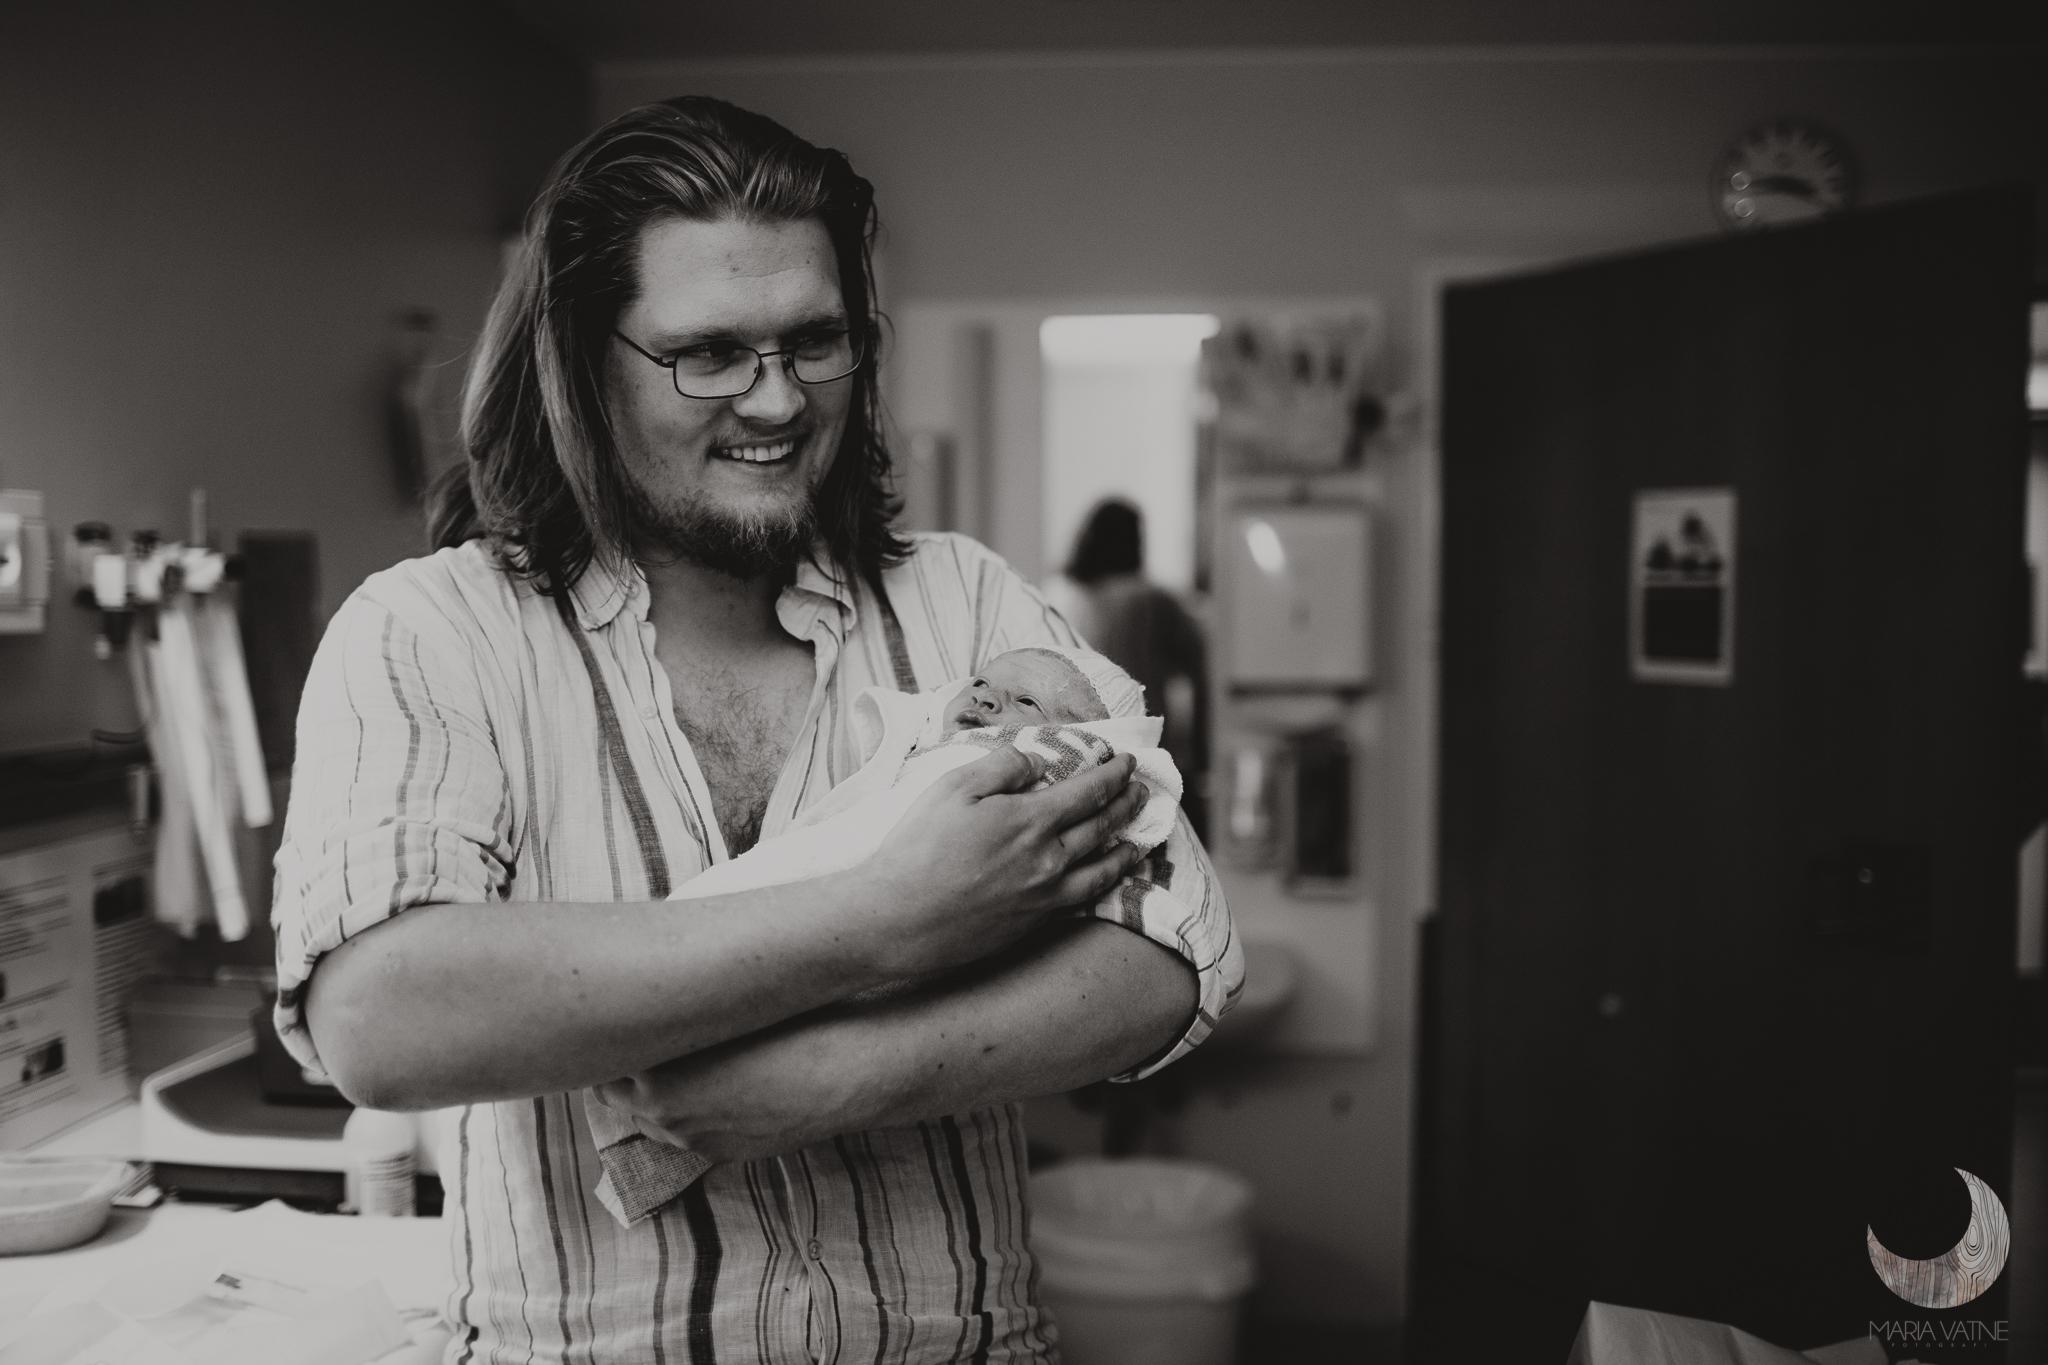 fotograf-fødselsfotograf-kongsberg-oslo-drammen-maria-vatne-nyfødtfotografering-137.jpg